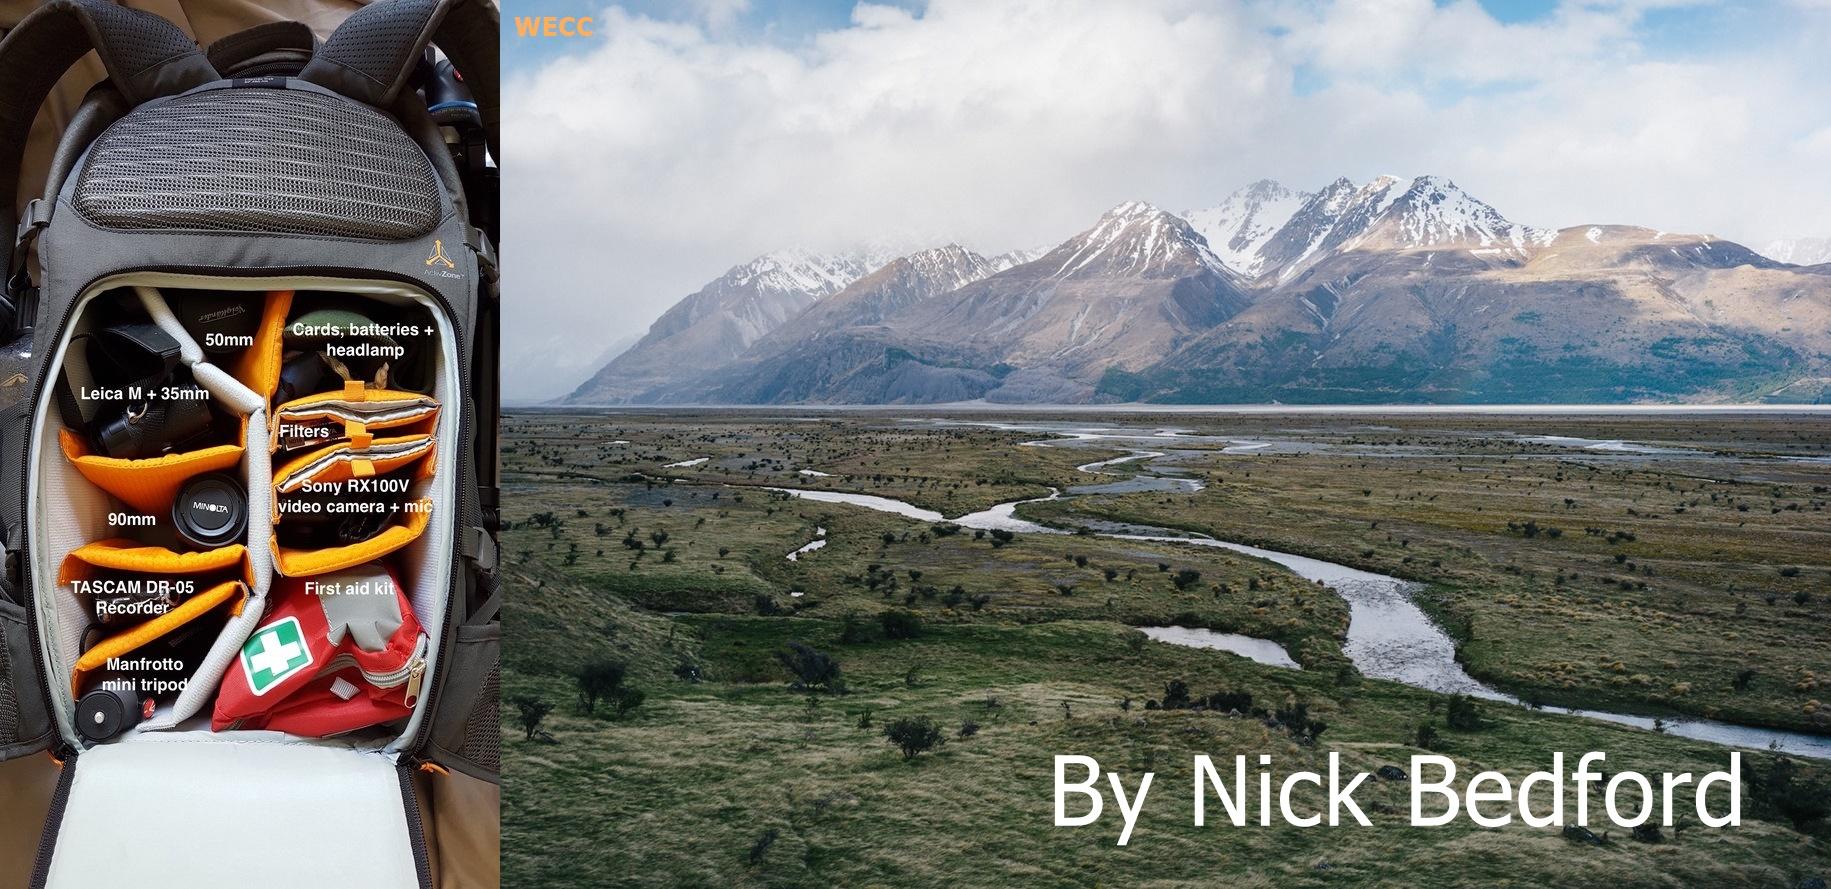 LowePro+Flipside+Trek+450+AW,+Inside+Layout,+Hiking,+Camera+Backpack,+Gear,+Manfrotto+Befree+Tripod,+Water+Bottle,+Trekking,+Travel,+MacBook+Retina-horz.jpg